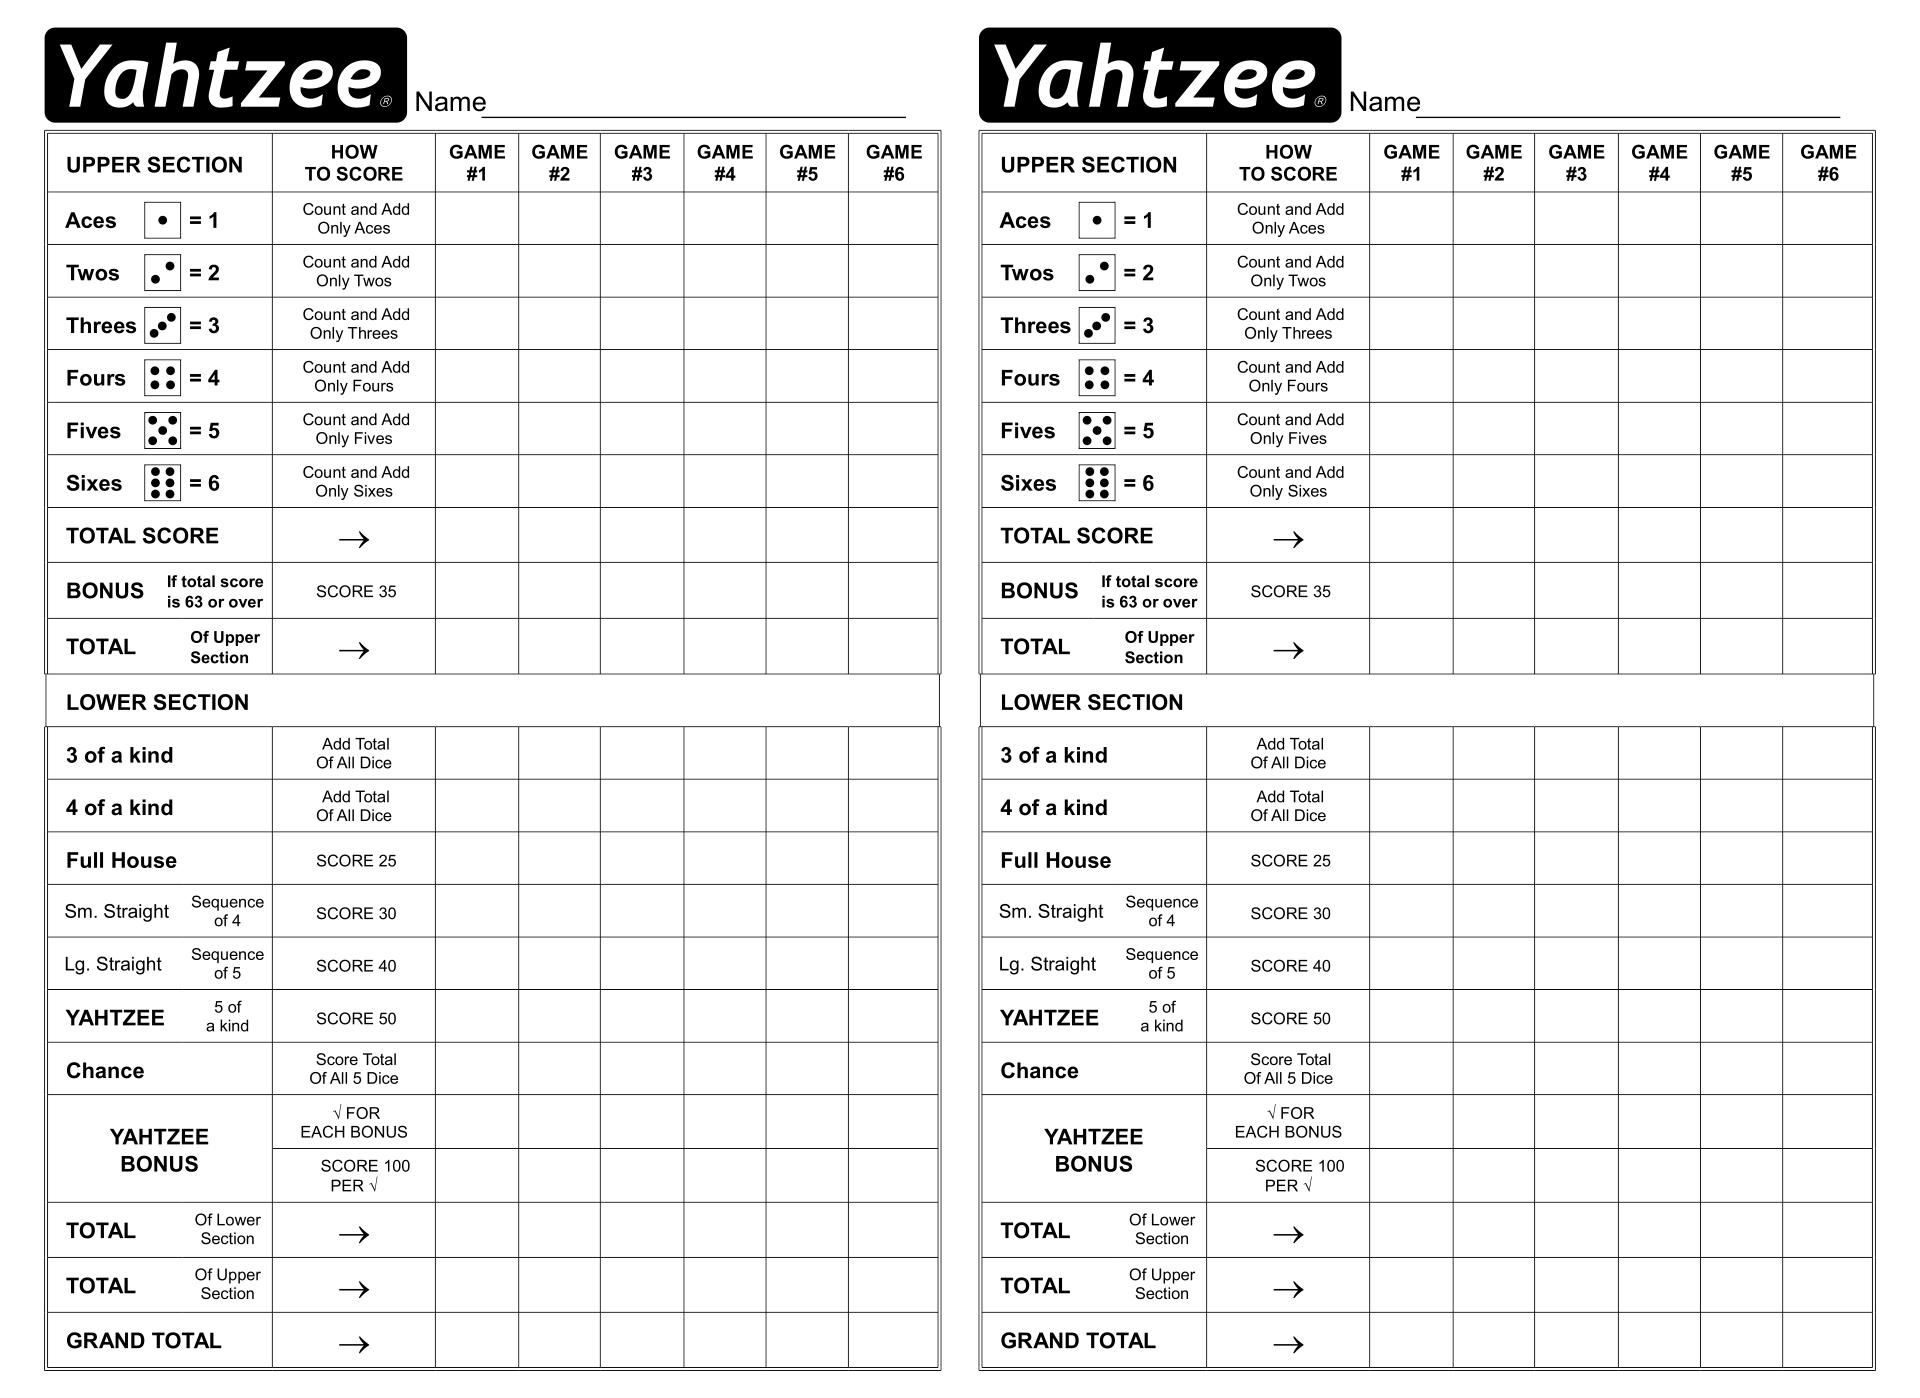 Printable Sheet Yahtzee Score Card